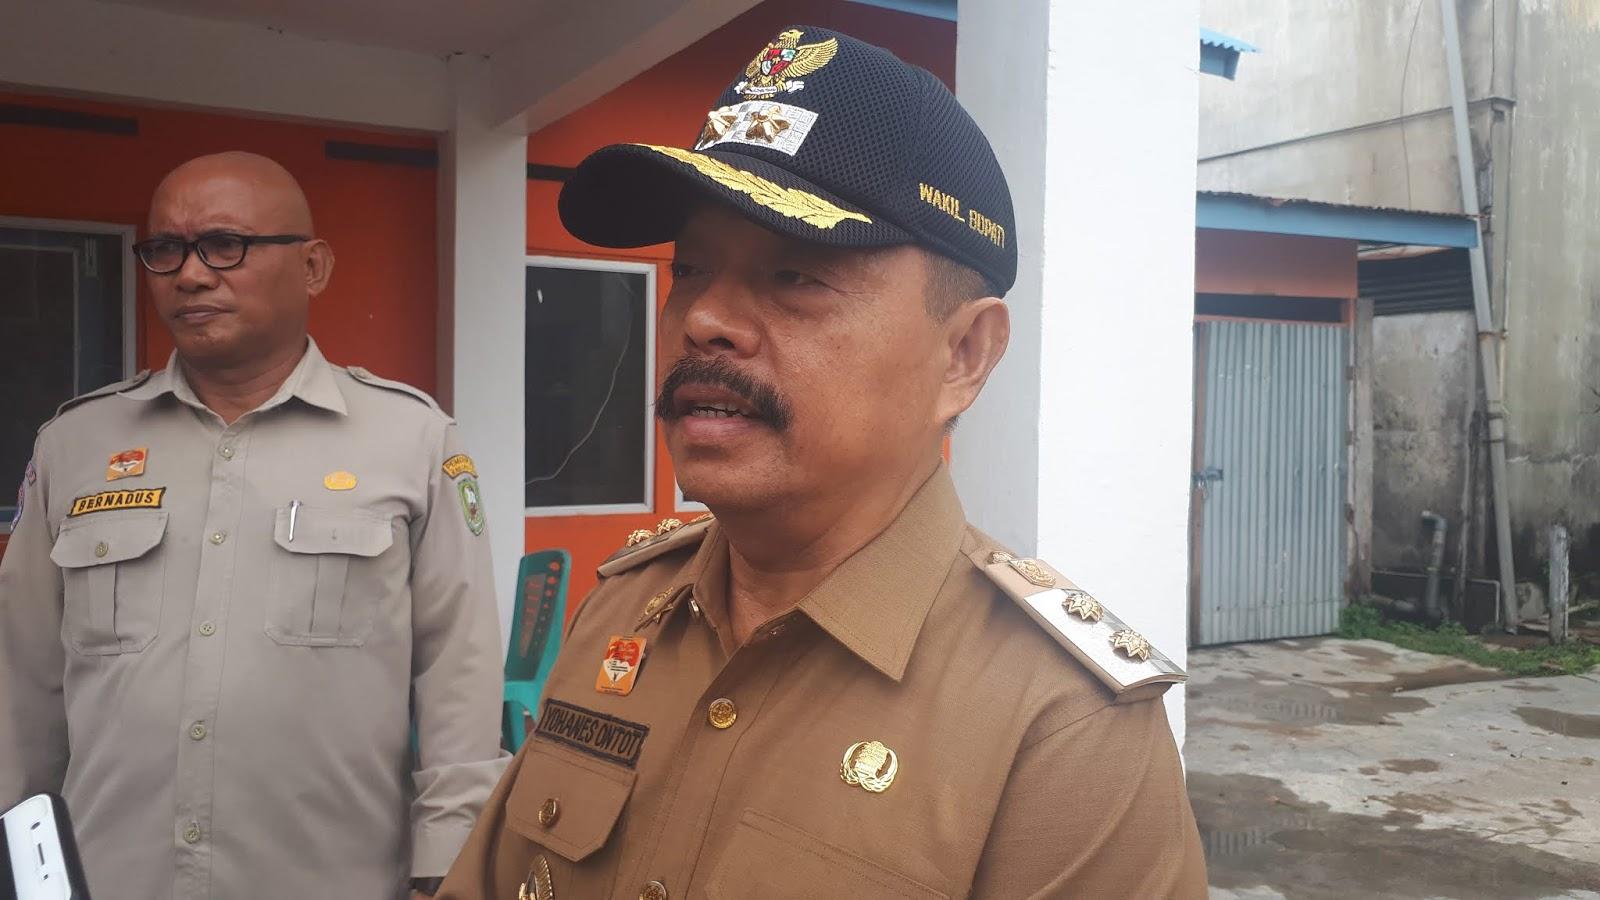 Wakil Bupati Sanggau: Mudah Mudahan Bukan Janji tinggal Janji